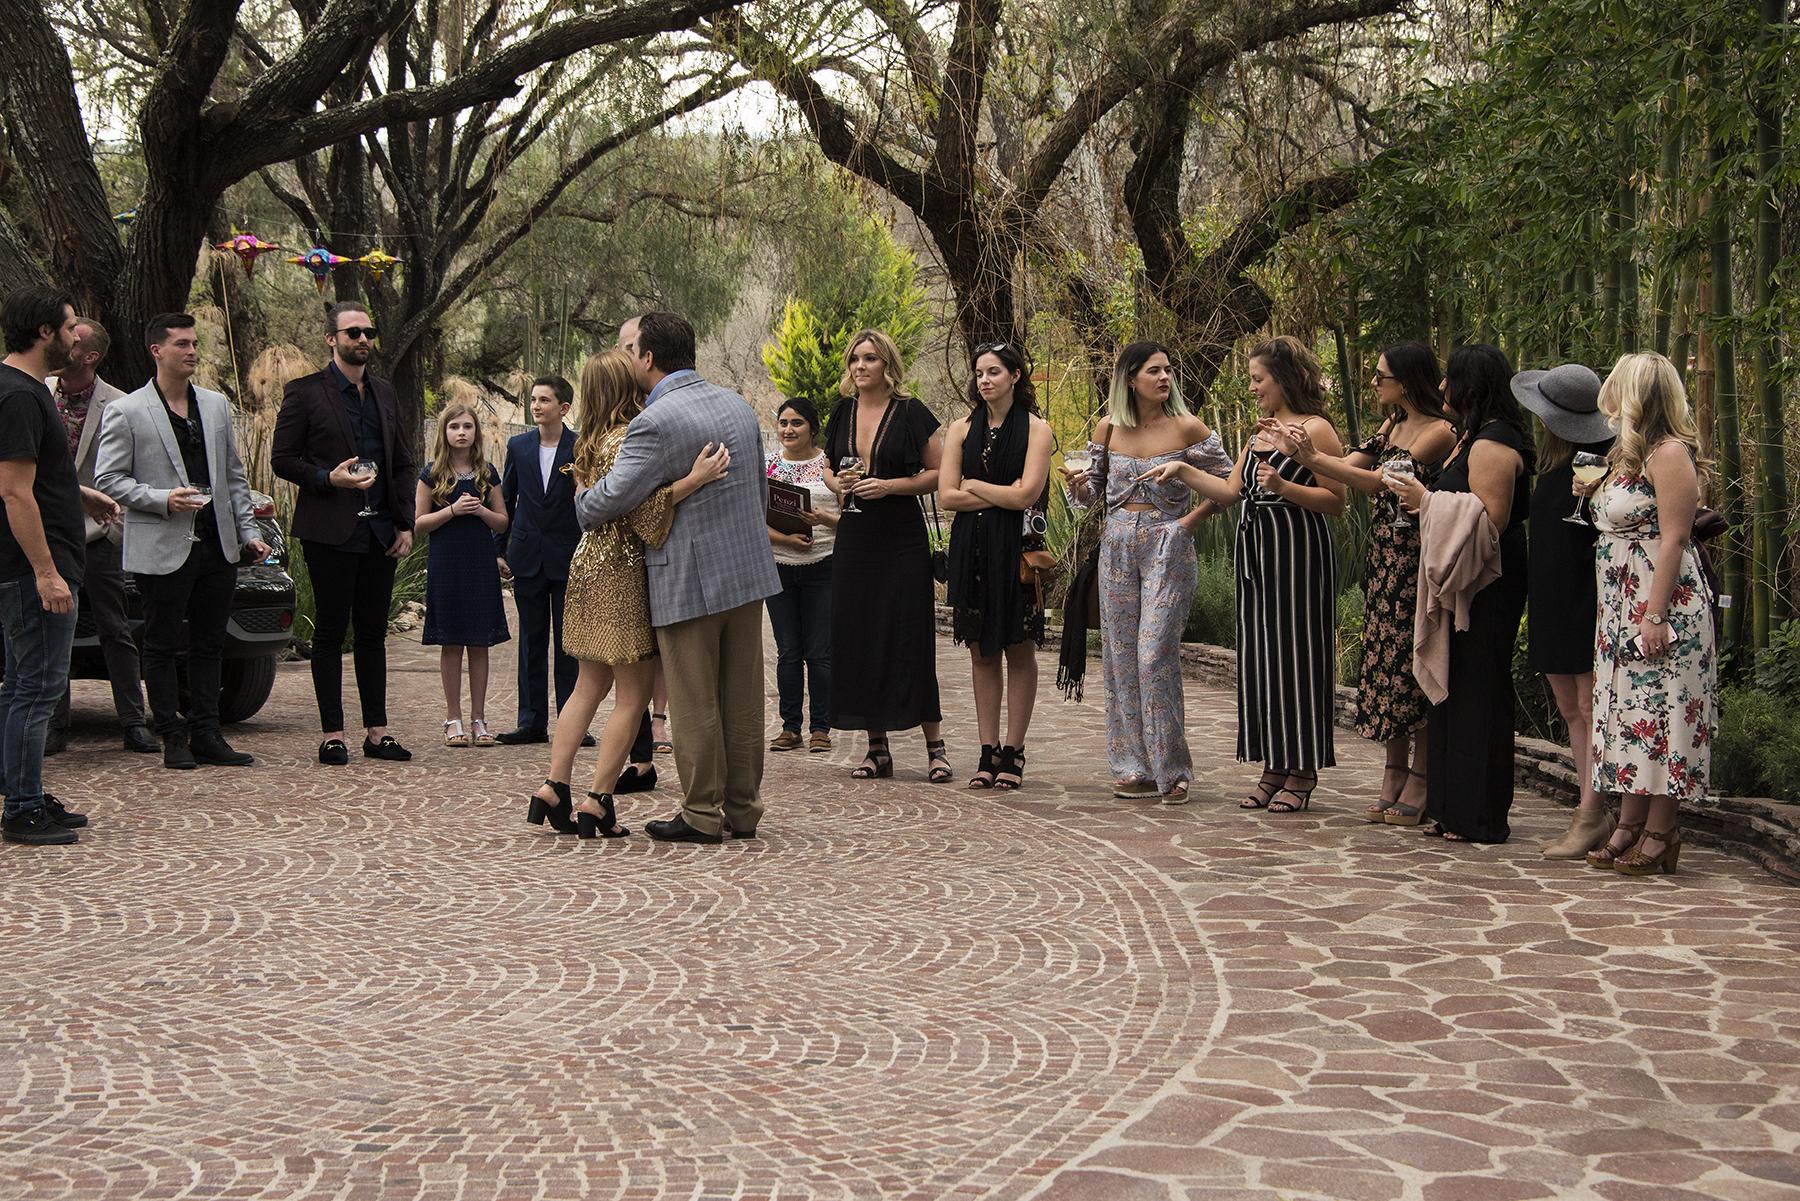 wedding rehearsal party